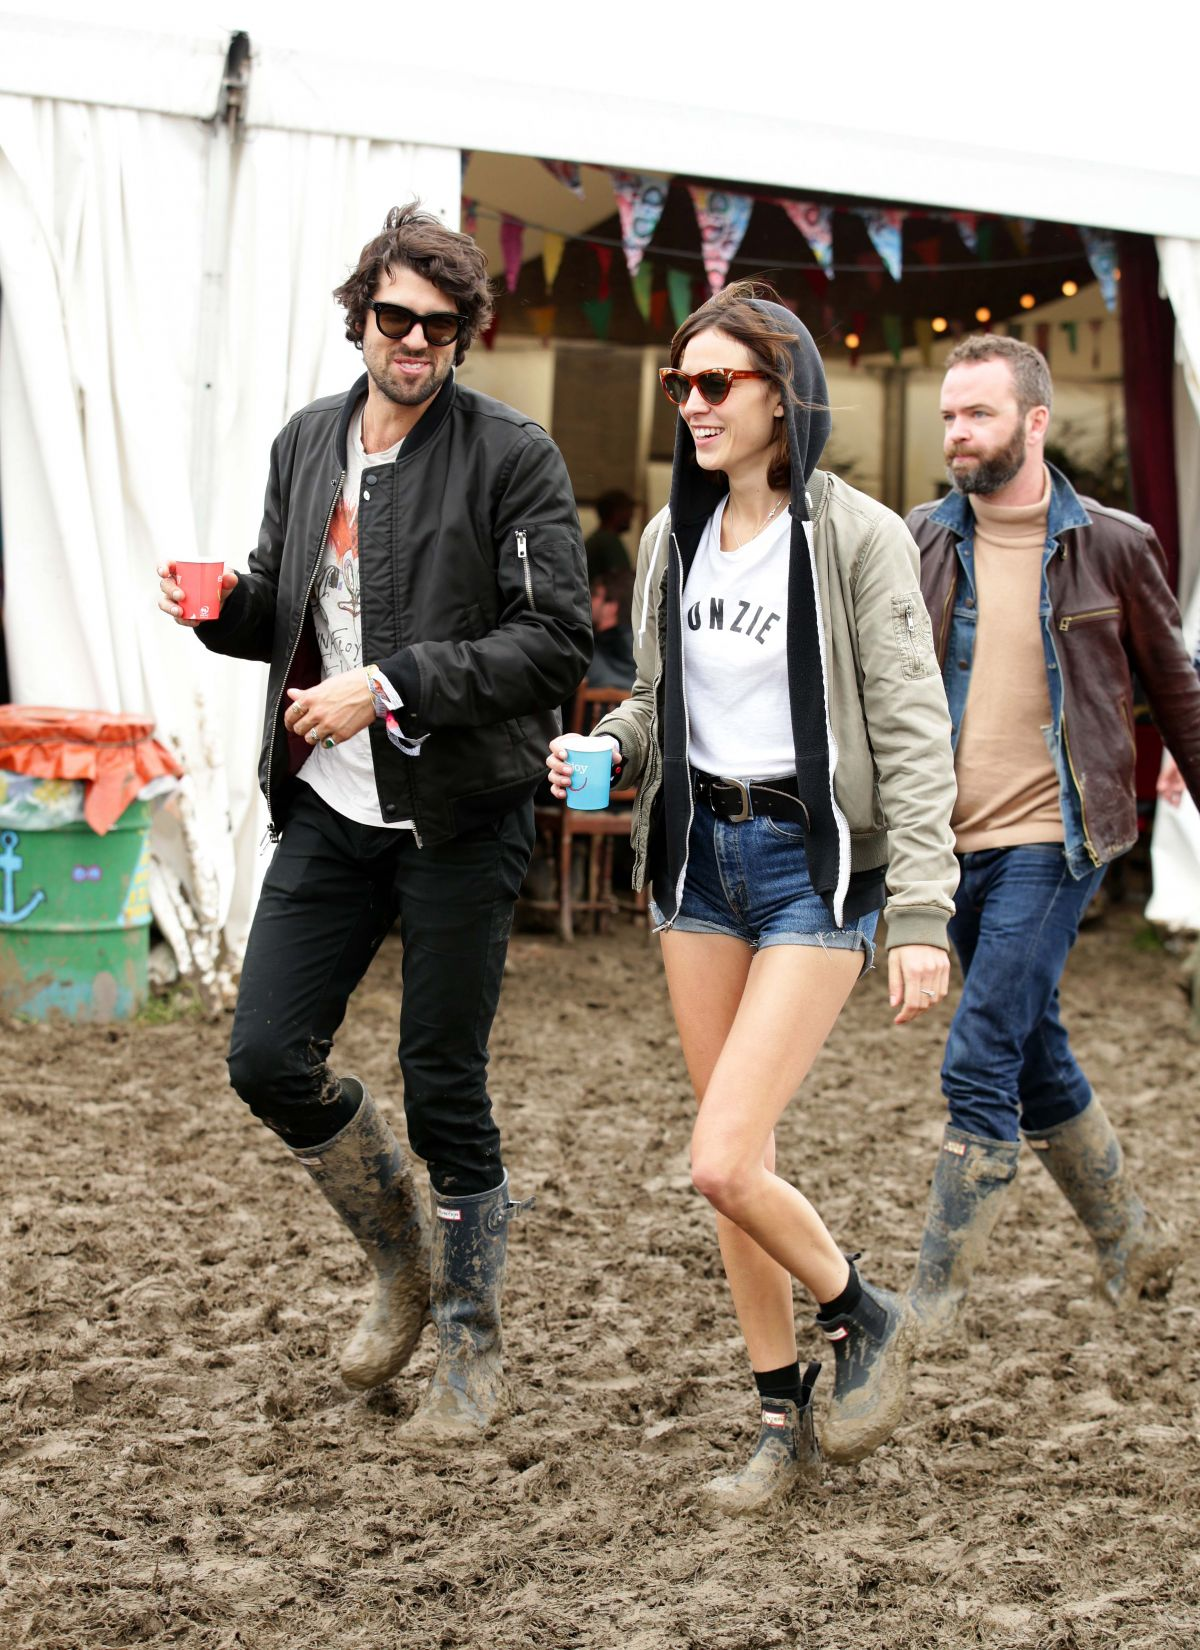 ALEXA CHUNG at 2016 Glastonbury Festival at Worthy Farm in Somerset 06/26/2016